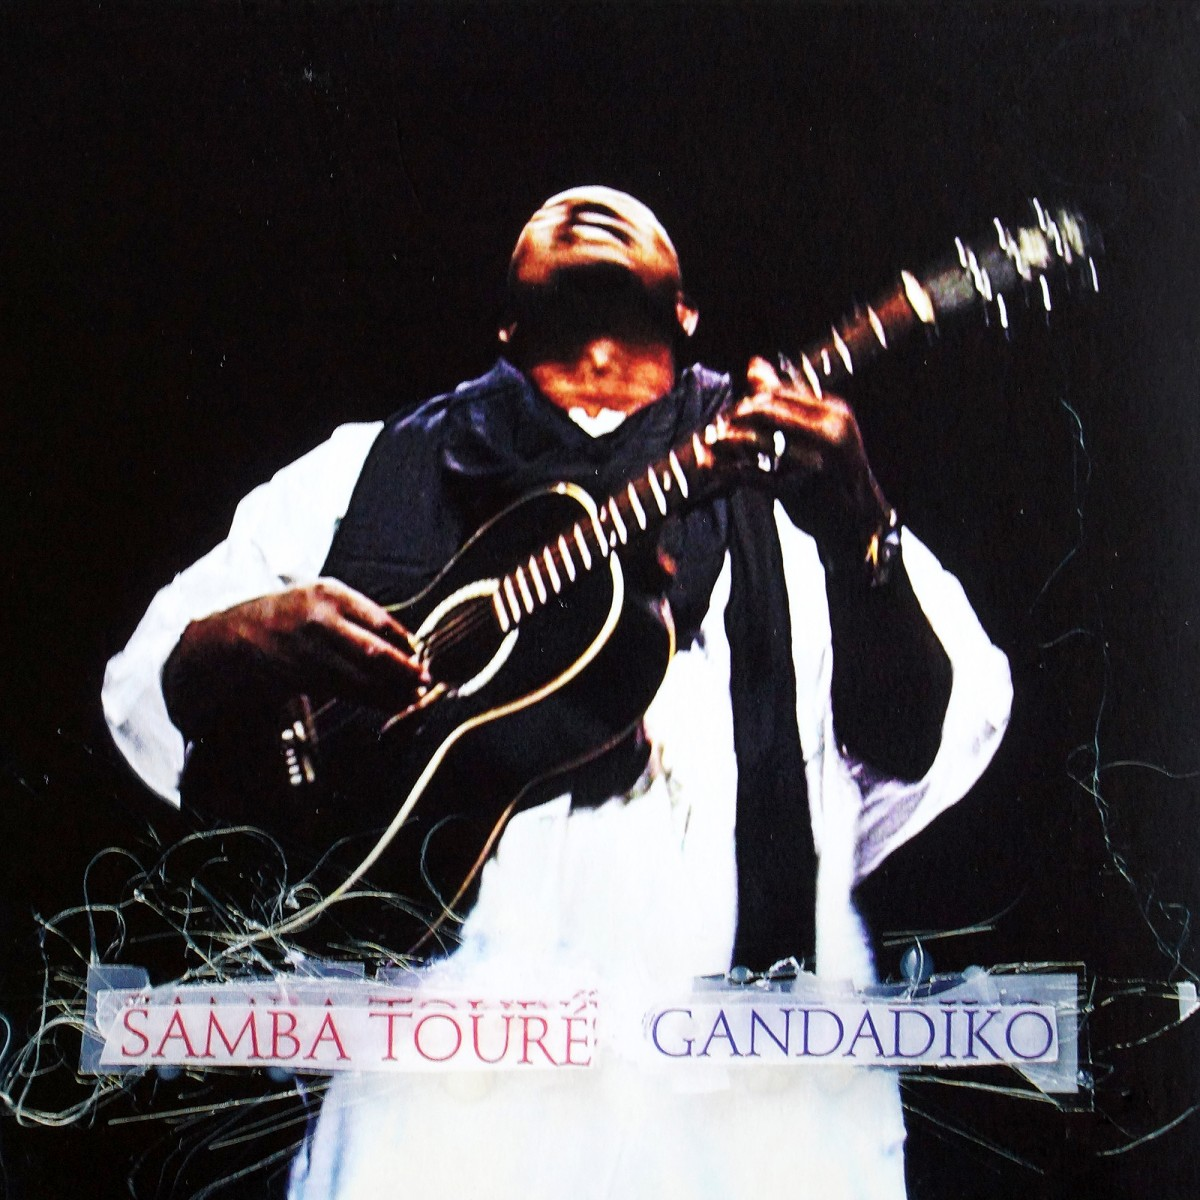 Samba Touré: Gandadiko (2015)